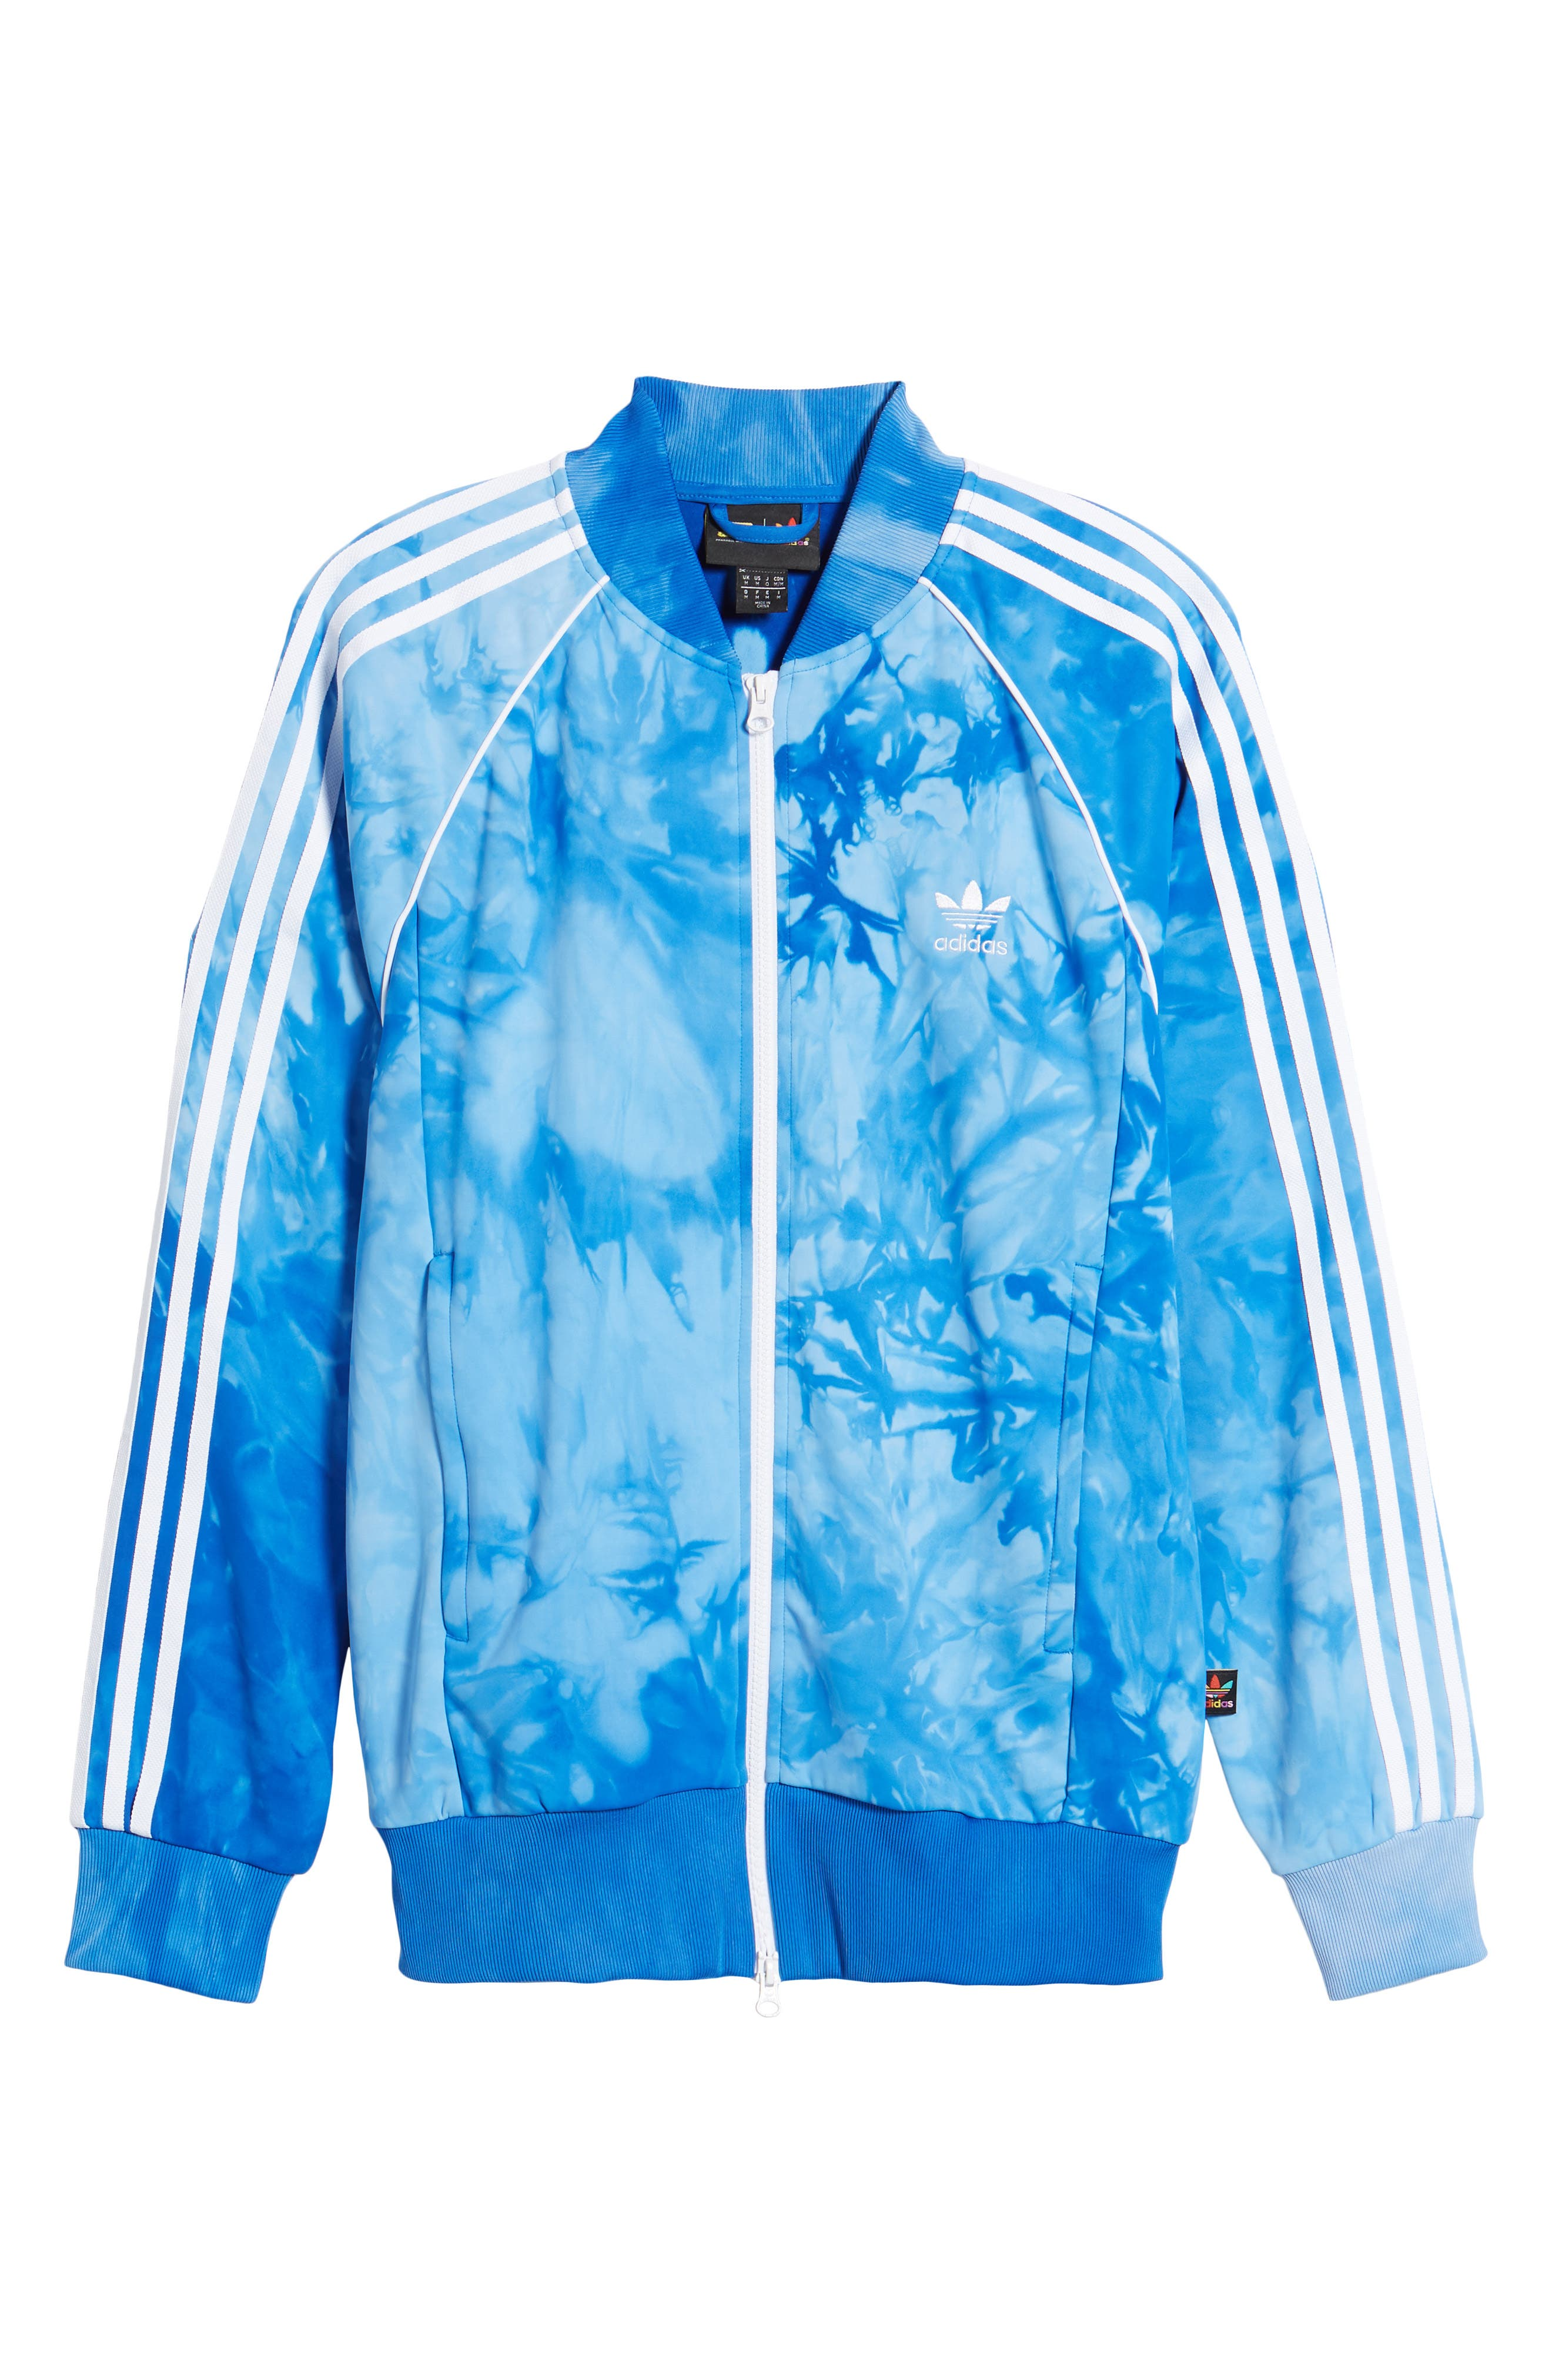 Hu Holi Track Jacket,                             Alternate thumbnail 6, color,                             Blue